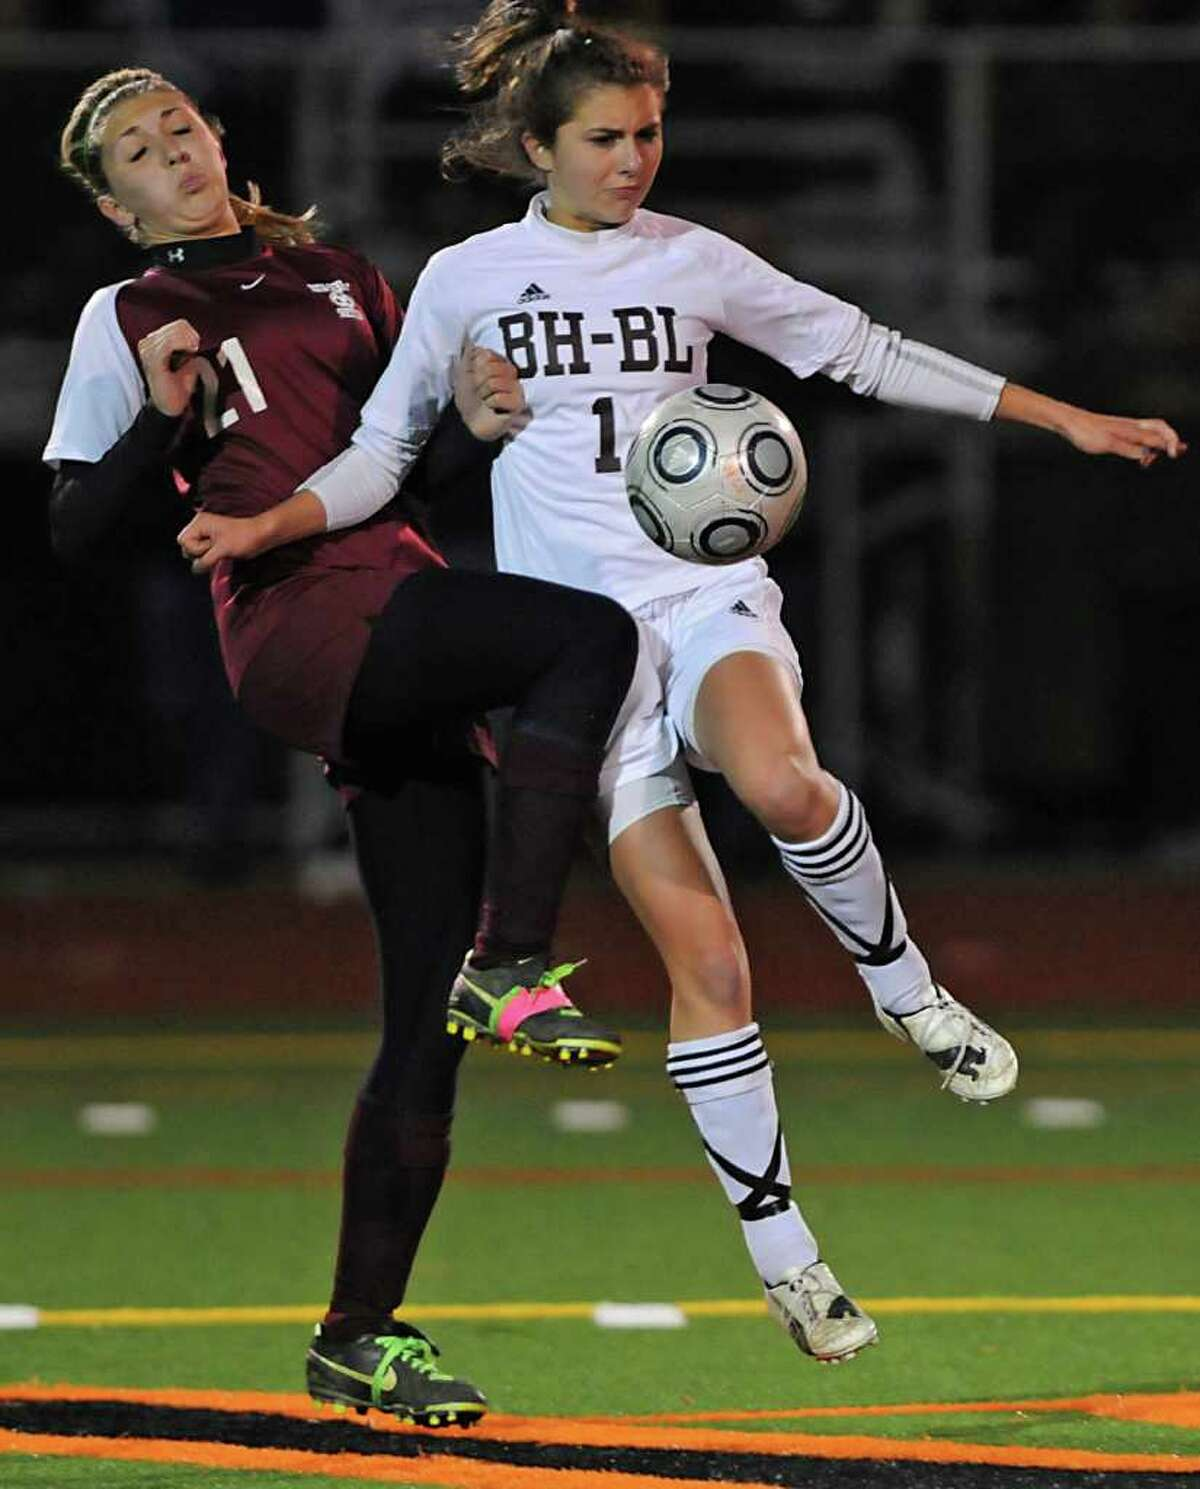 High school soccer -- Jess Presti of Scotia, left, battles for the ball with Bryony Striffler of Burnt Hills. (Lori Van Buren / Times Union)